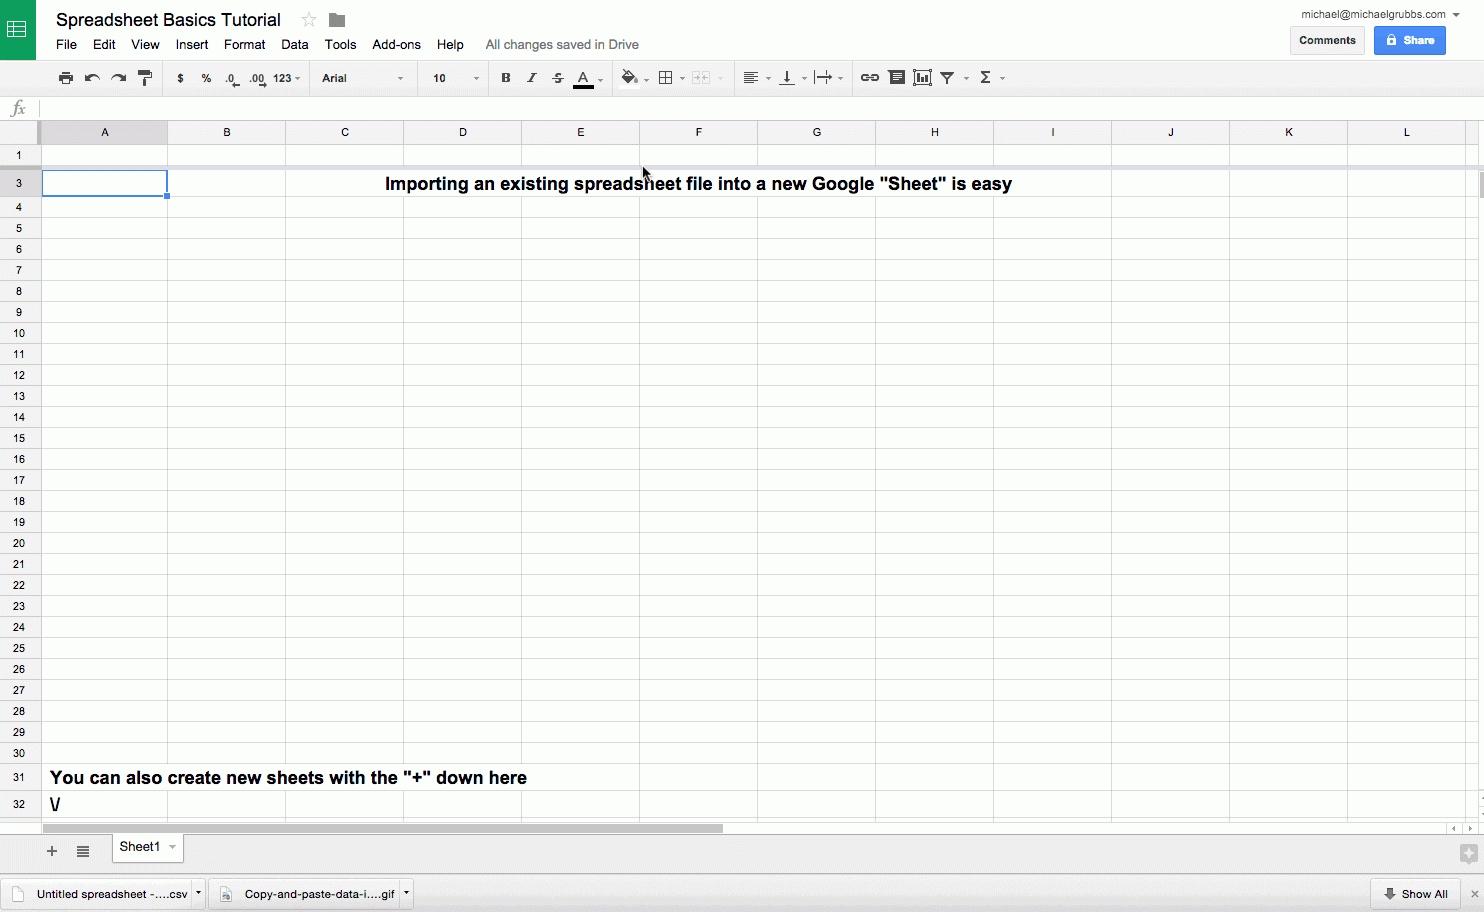 Excel Spreadsheet For Dummies Online | Sosfuer Spreadsheet Throughout Excel Spreadsheet For Dummies Online